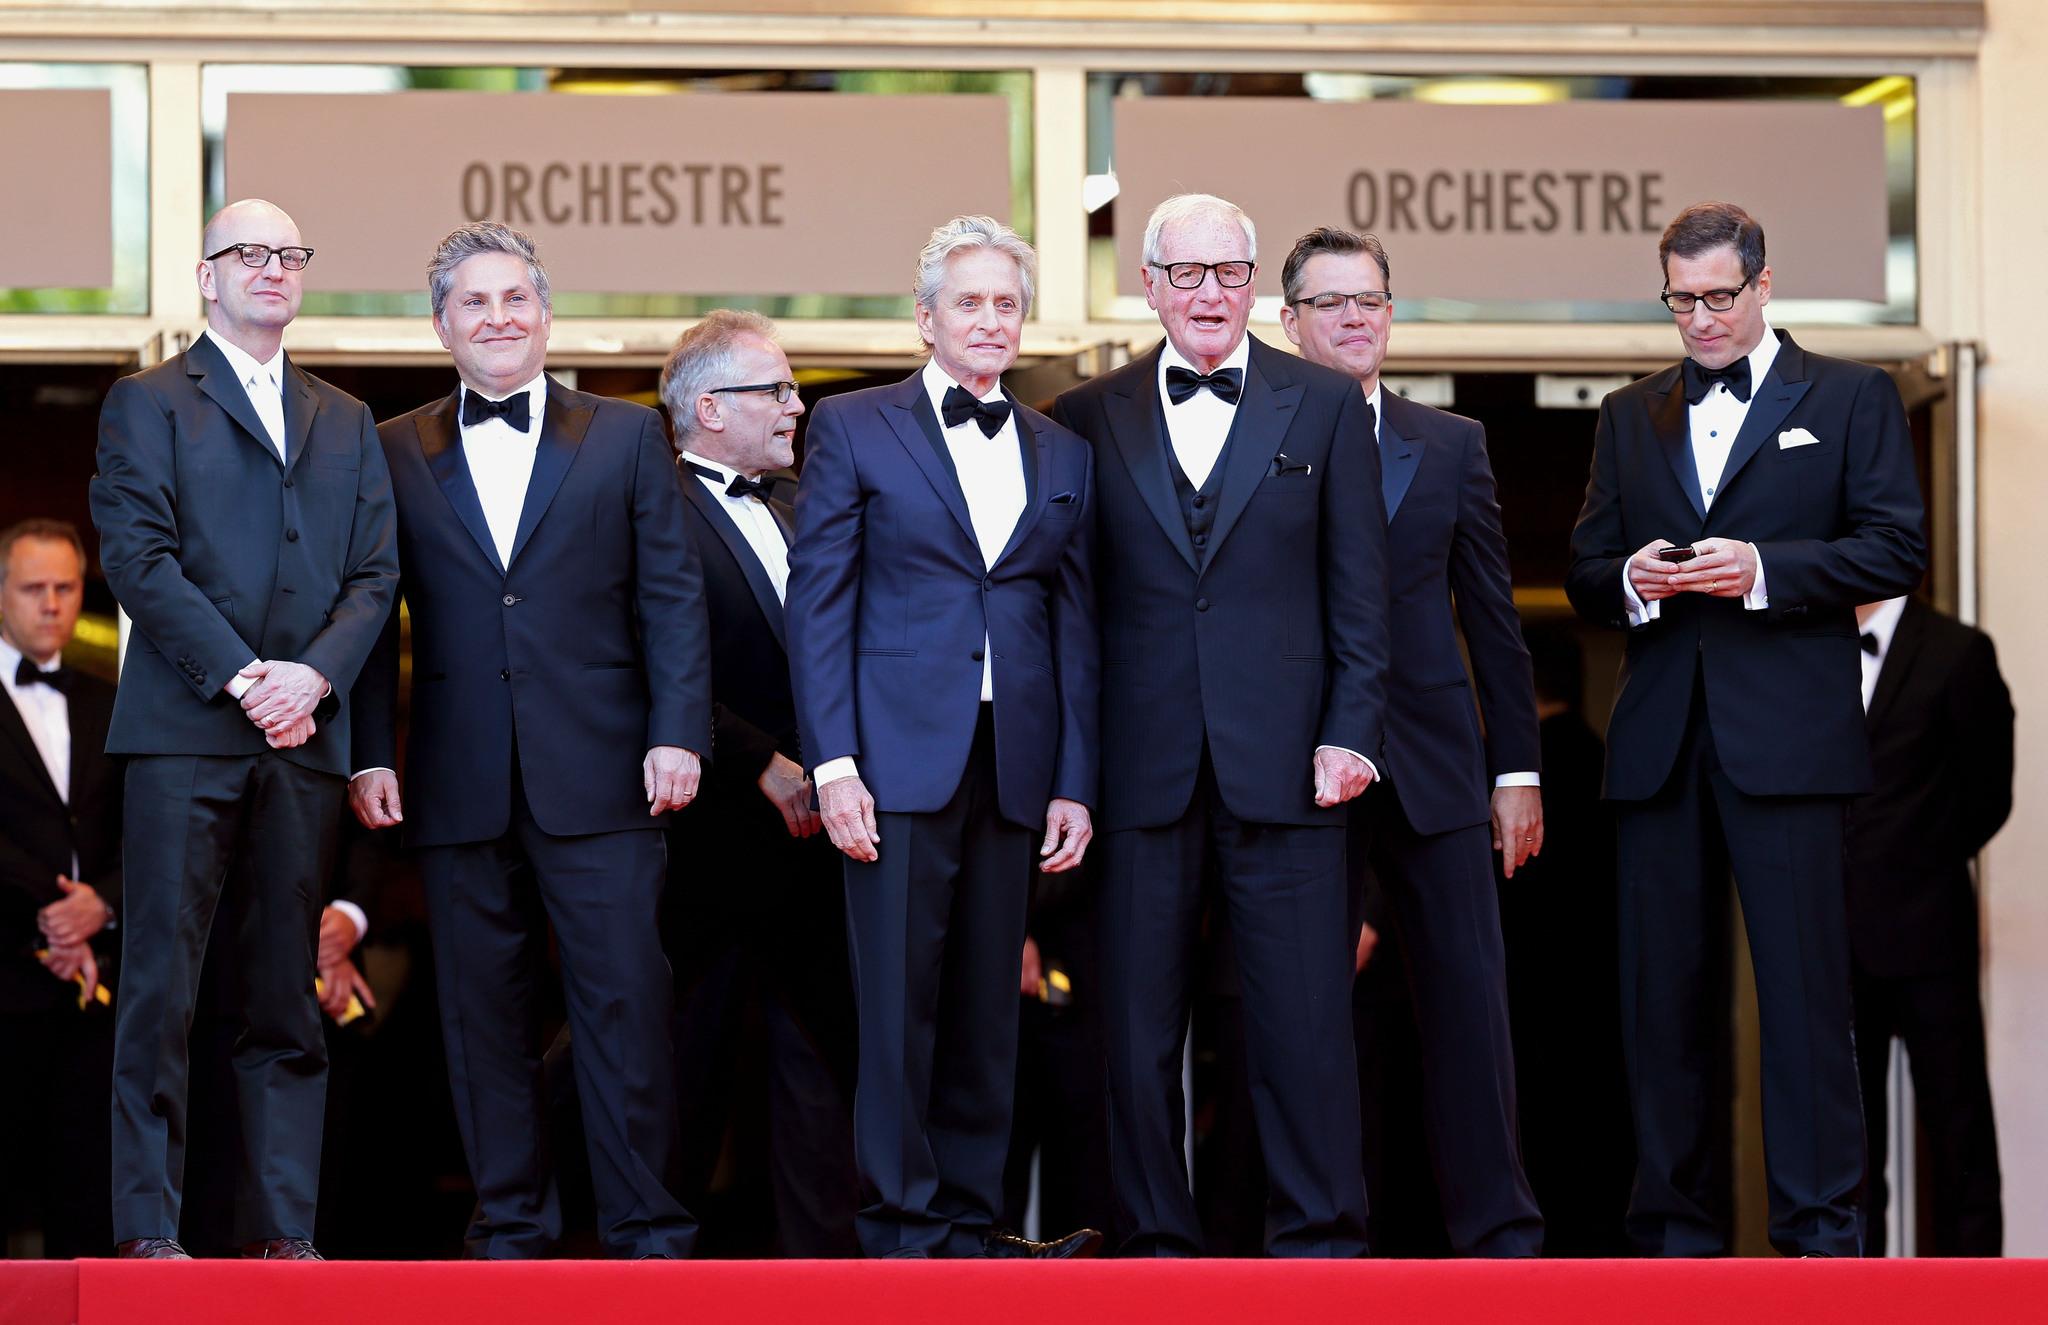 Michael Douglas, Matt Damon, Steven Soderbergh, Jerry Weintraub, Richard LaGravenese and Scott Thorson at event of Behind the Candelabra (2013)